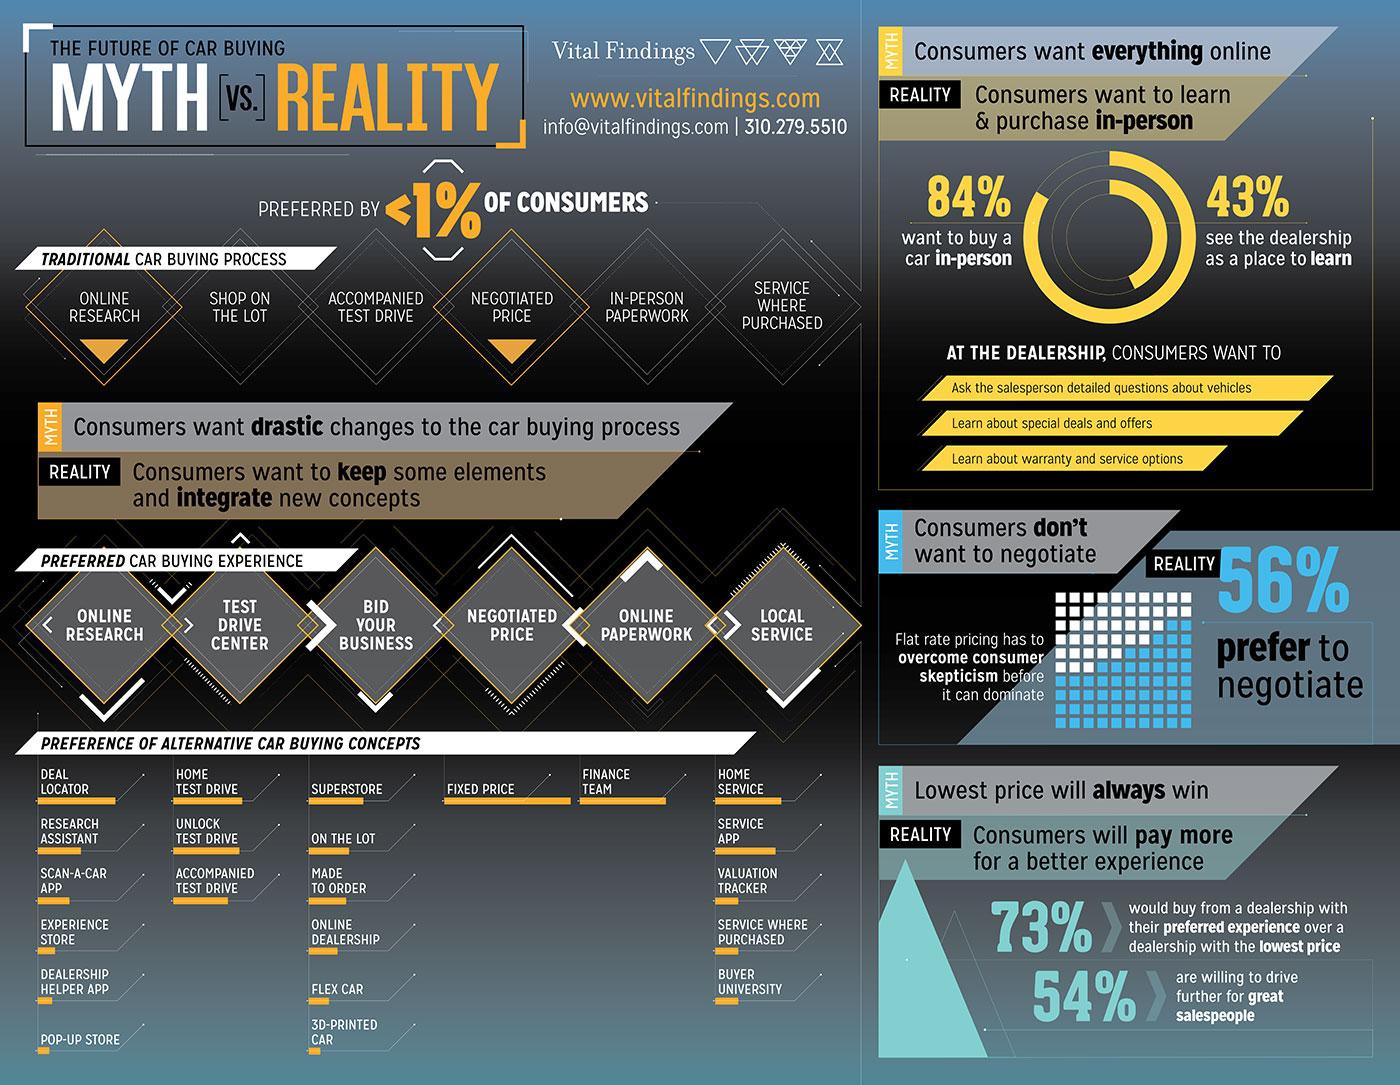 The Future of Car Buying - Myth vs Reality